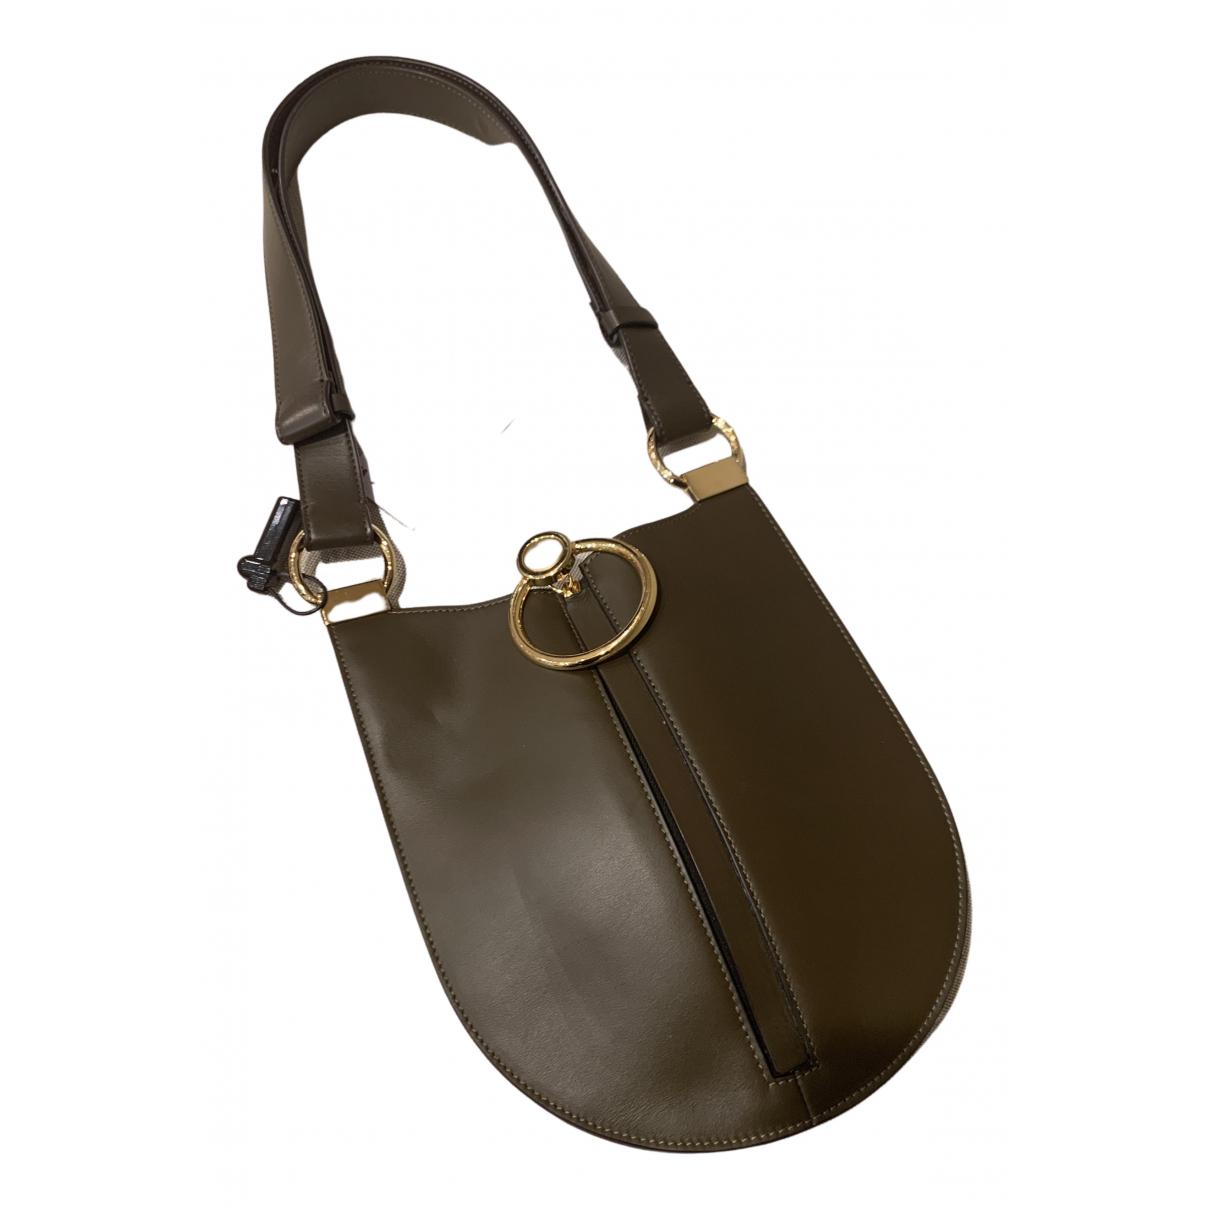 Marni N Khaki Leather handbag for Women N